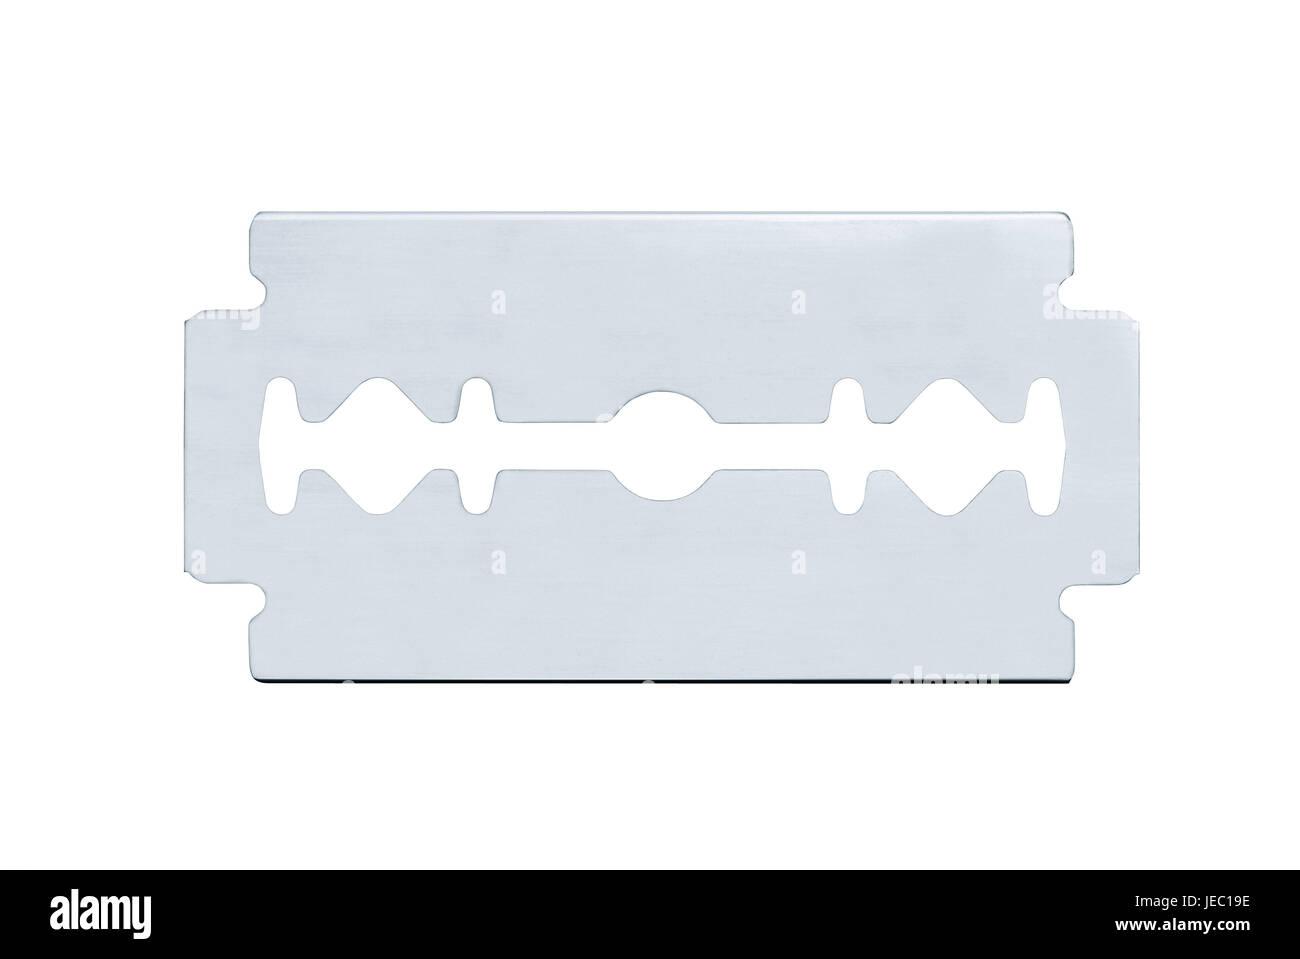 Razor blade, - Stock Image